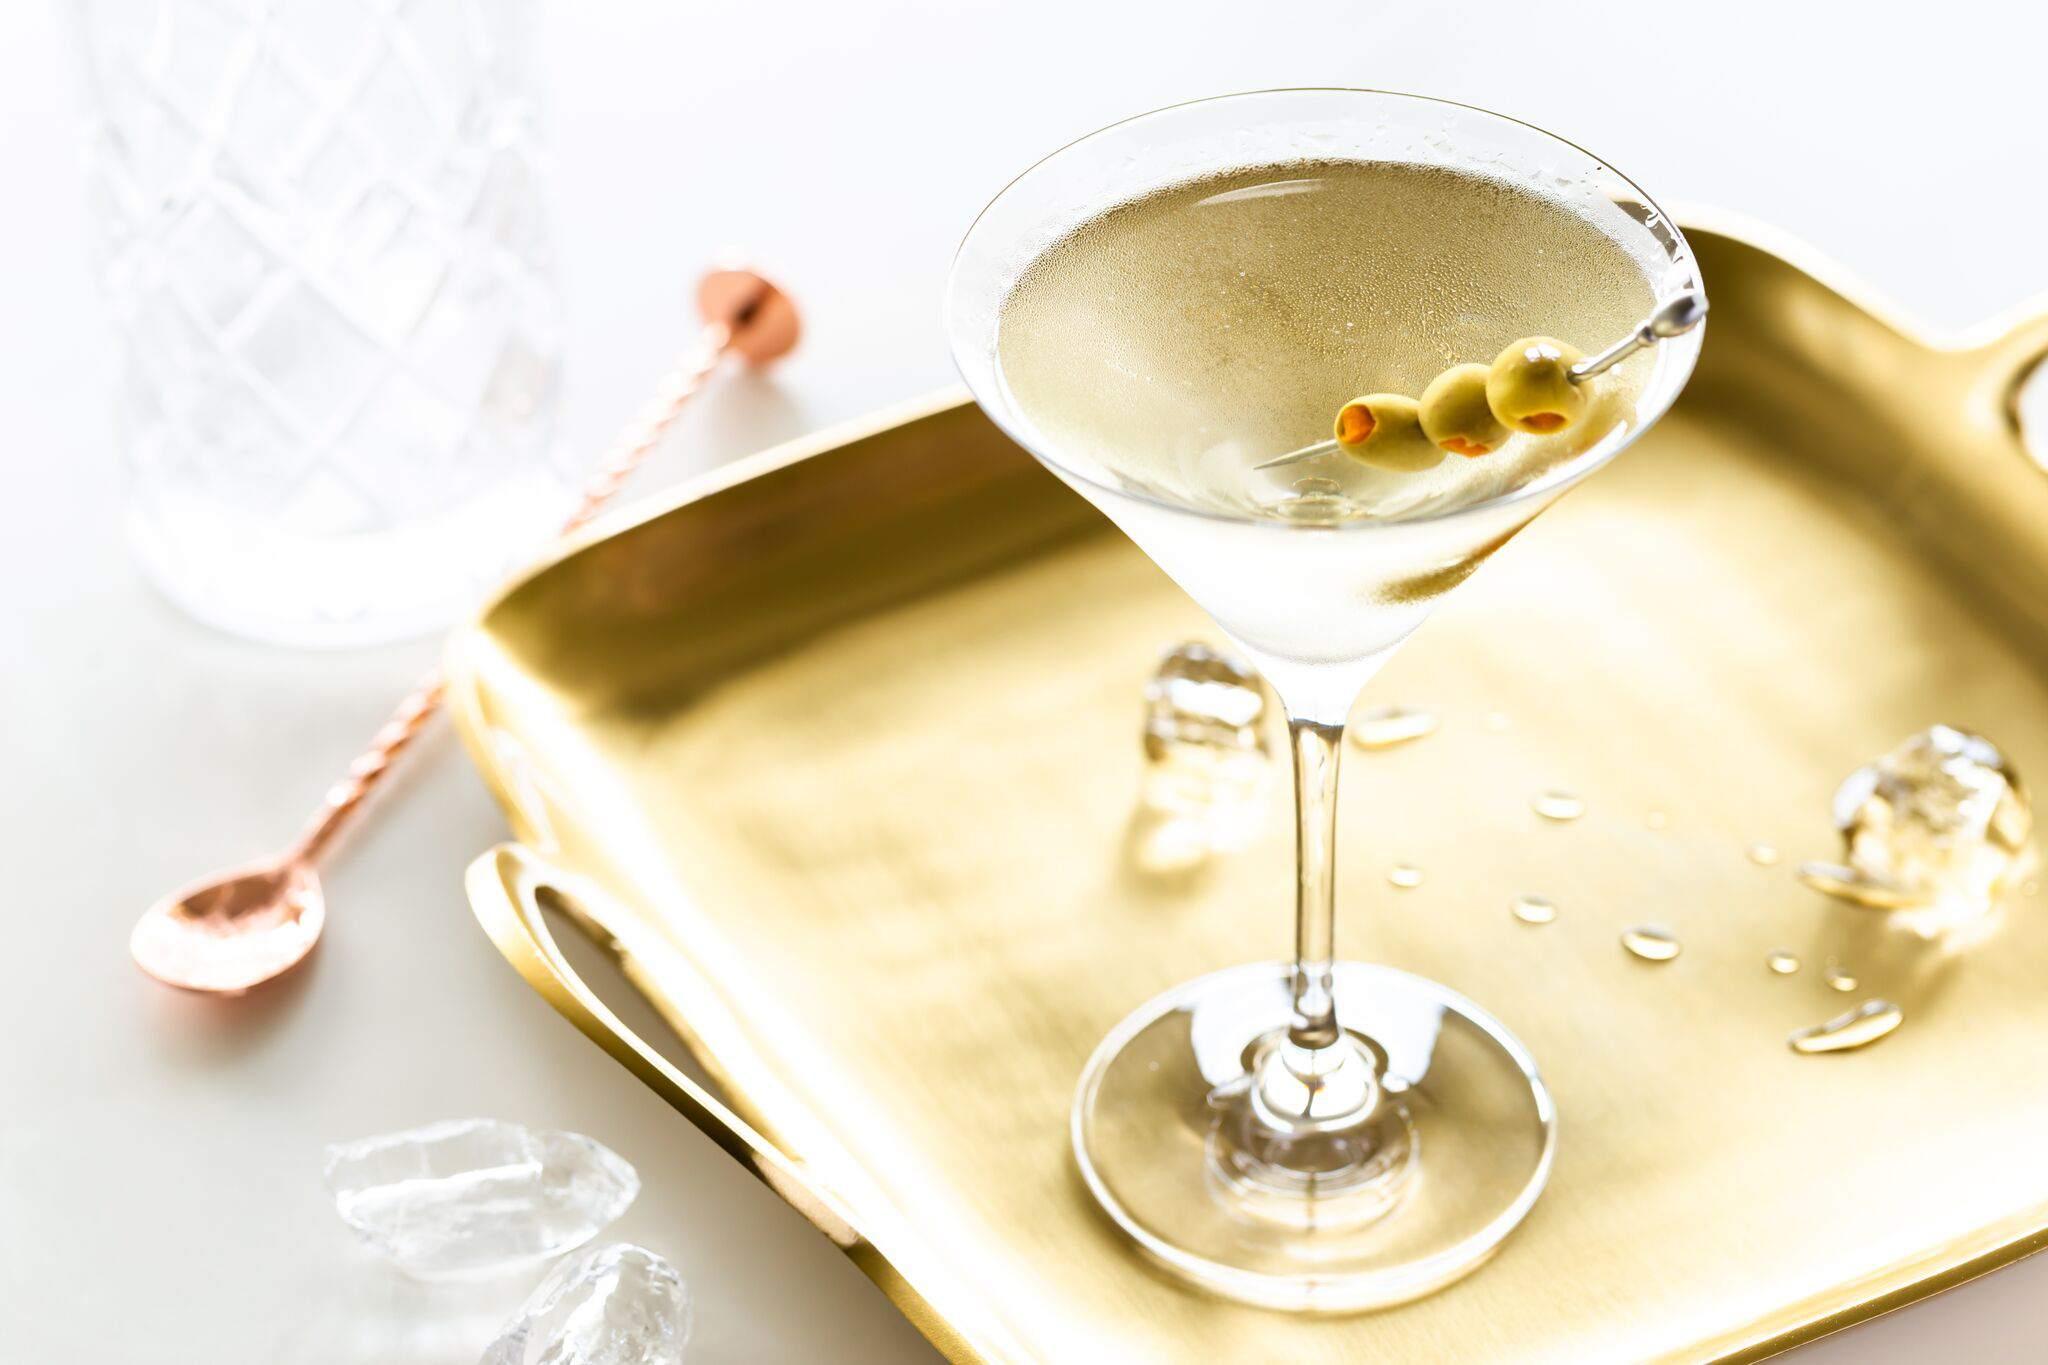 dirty-martini-cocktail-recipe-759643-15_preview-5b02f935c064710036ff4c24.jpeg